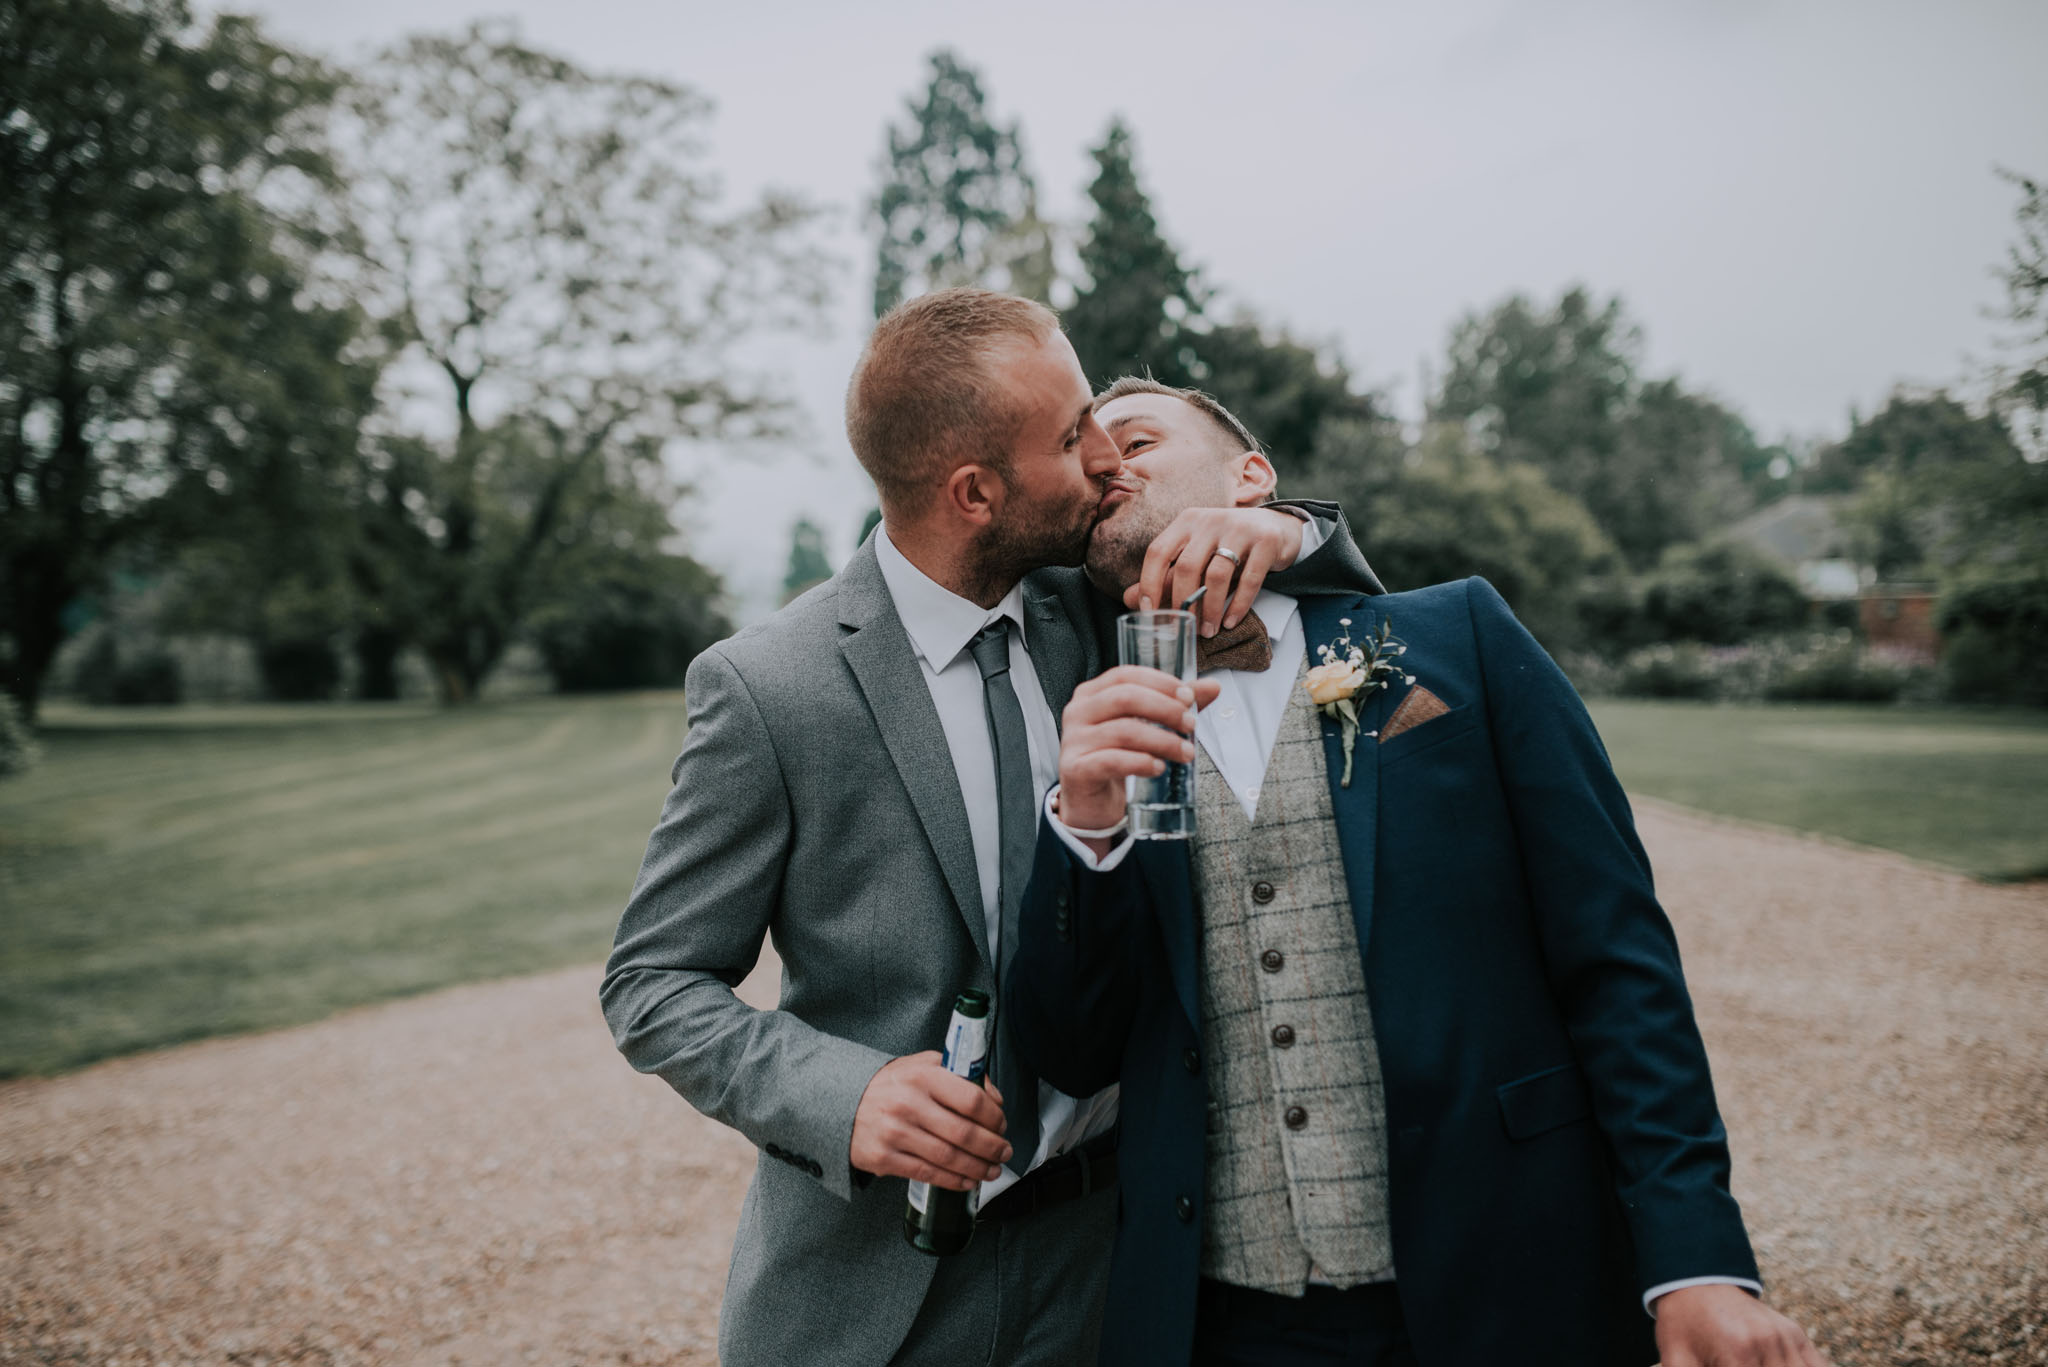 wedding-photographer-glewstone-court-hereford-scott-stockwell-photography359.jpg